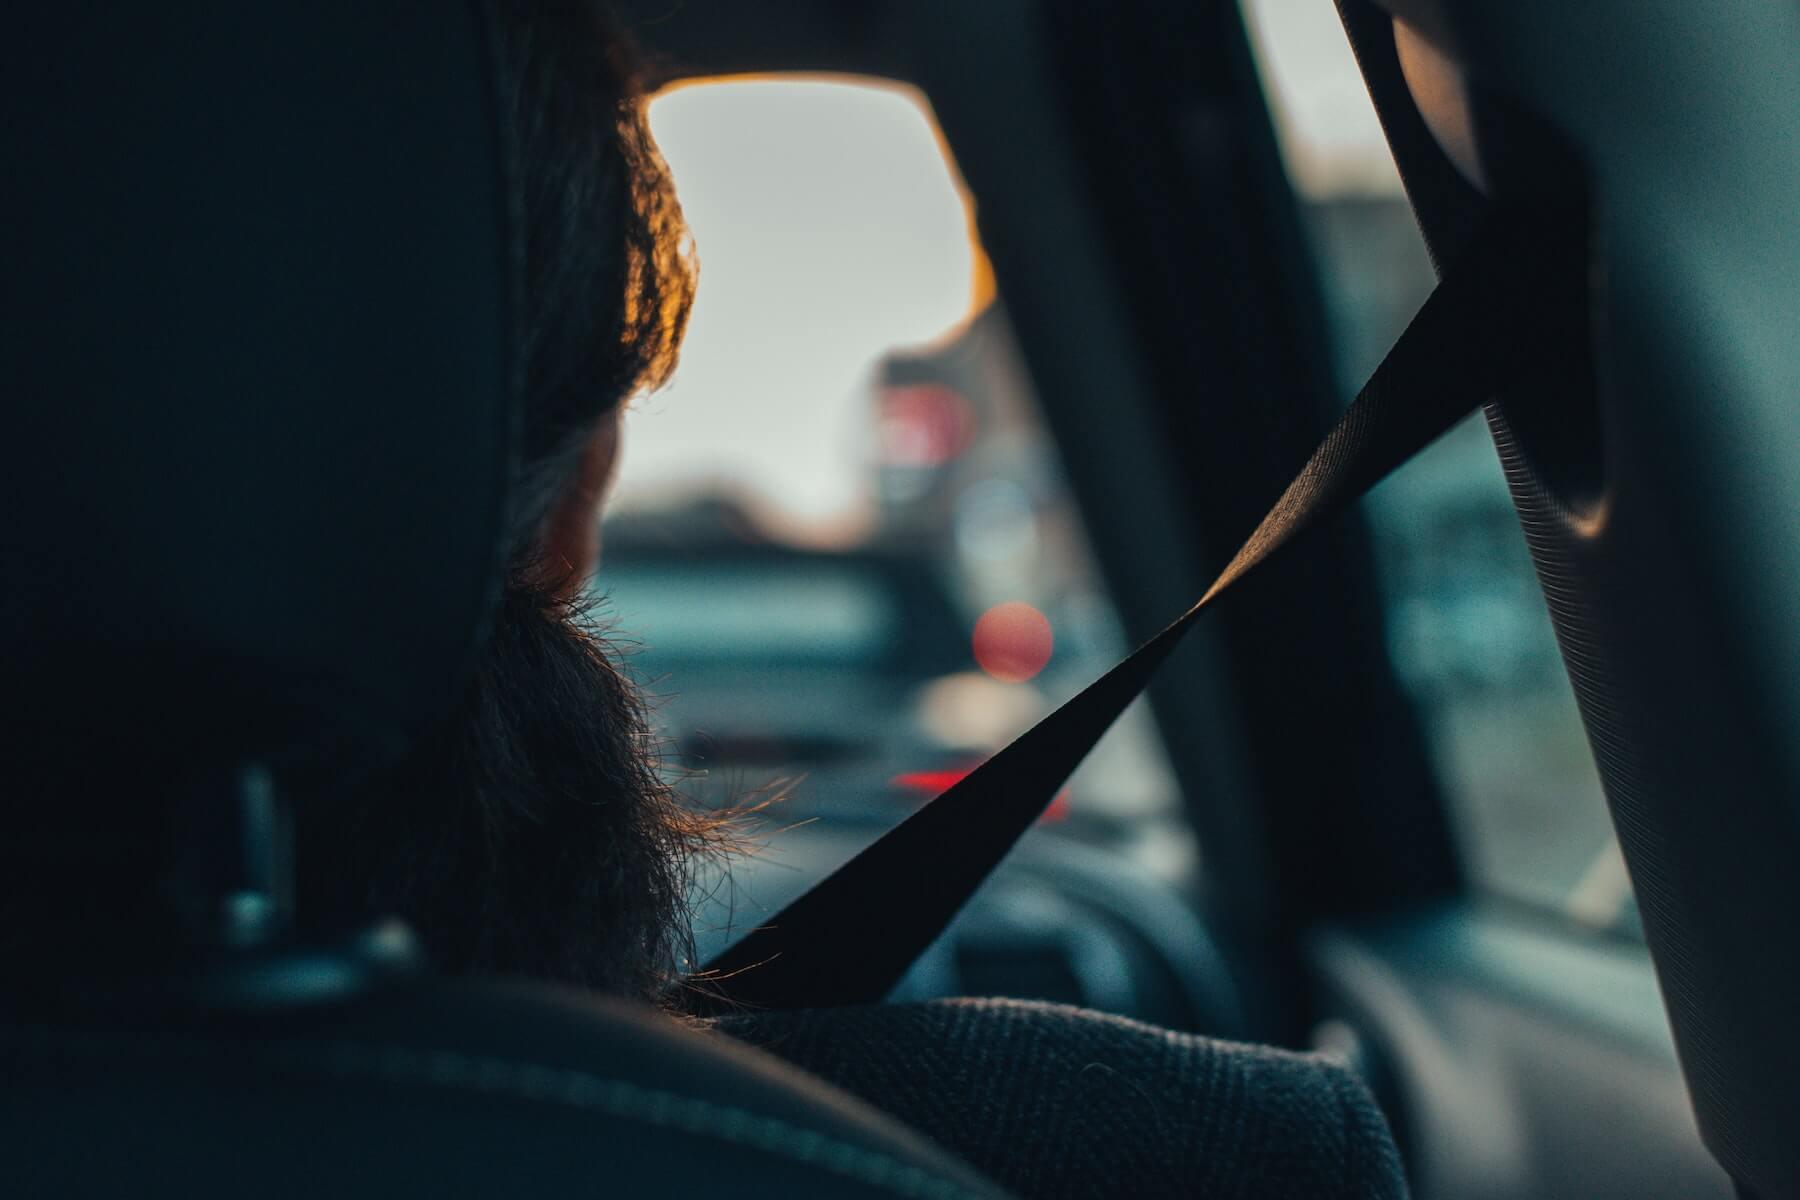 Passenger in Car Image